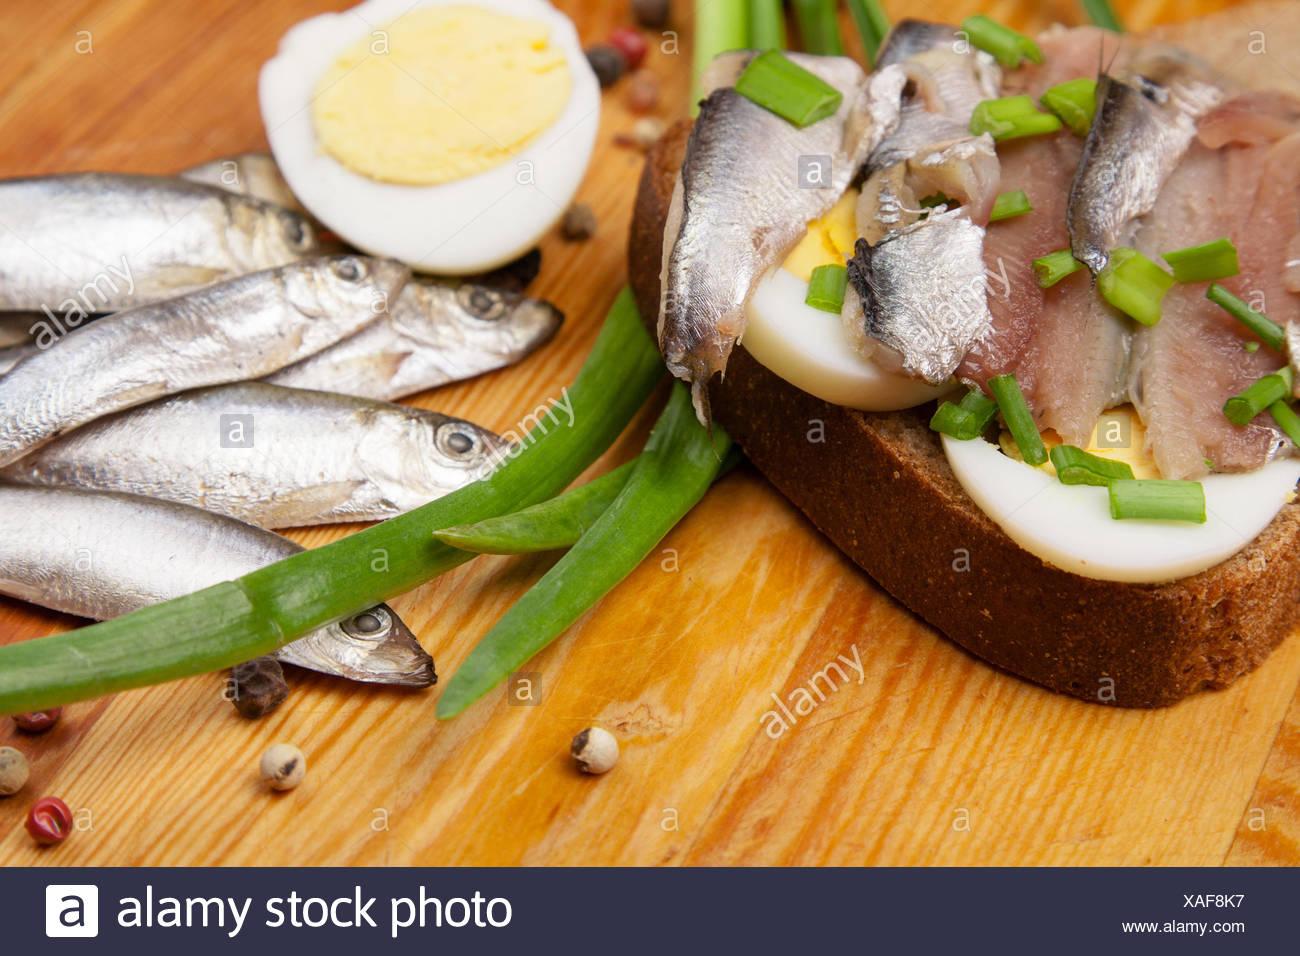 food aliment bread salt pepper wood shell silver freshness small tiny little short spring bouncing bounces hop skipping frisks - Stock Image